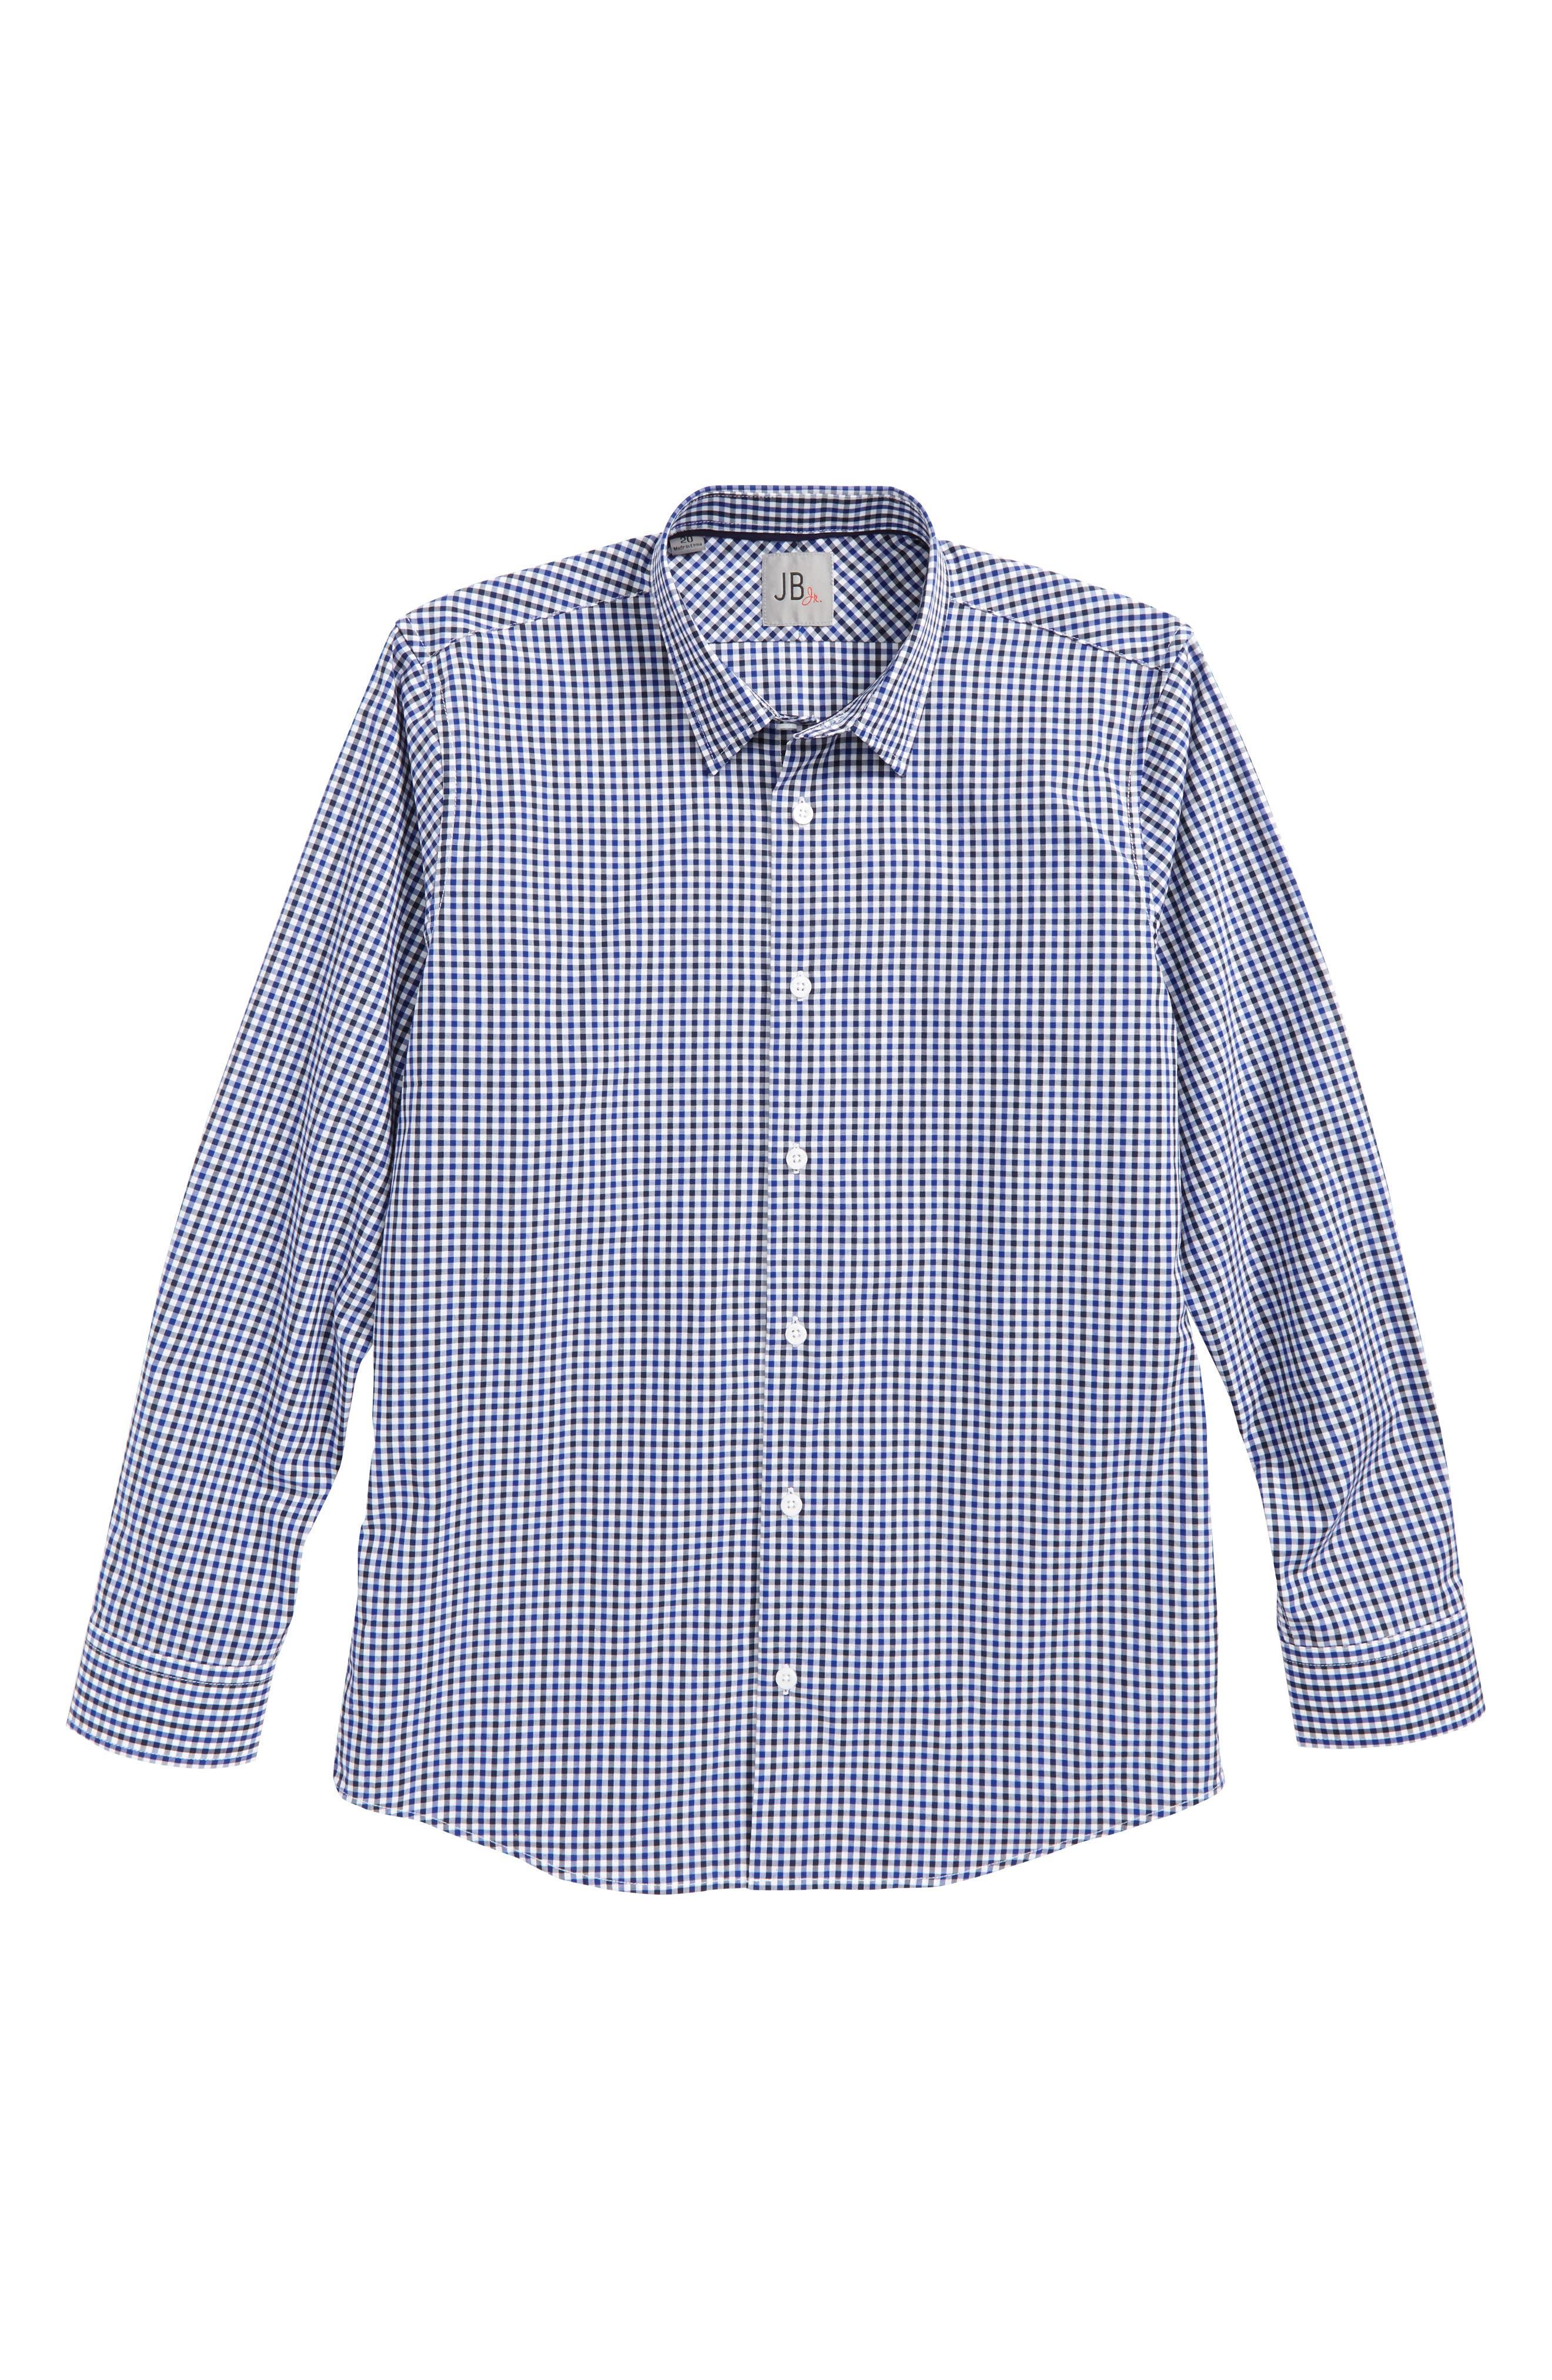 Main Image - JB JR Neat Check Dress Shirt (Big Boys)